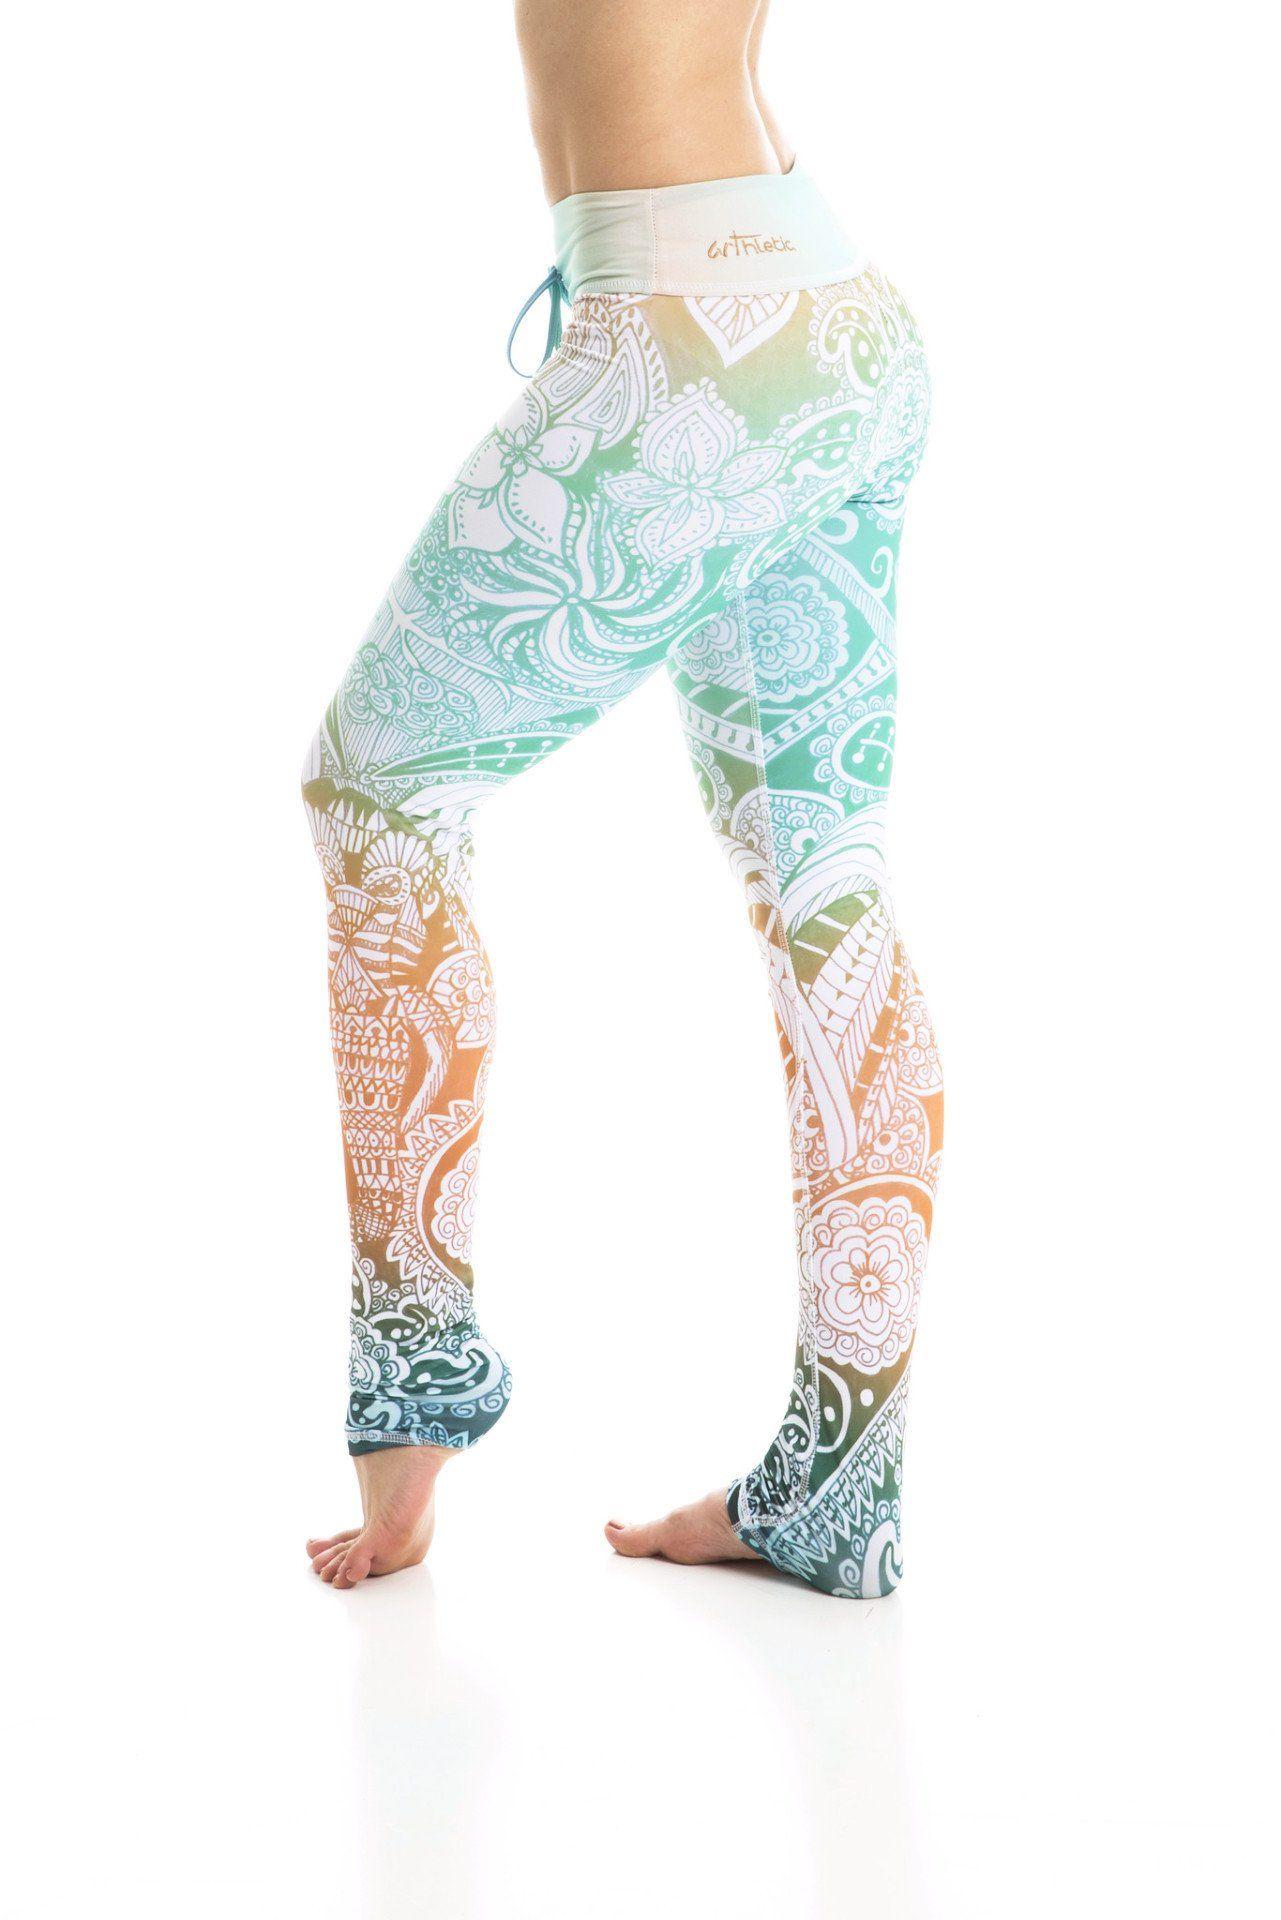 818d1fc43488c Om Shanti   Unique Yoga Pants   Custom Athletic Apparel   Sexy Leggings    Workout Clothes   – Uniquely Yoga